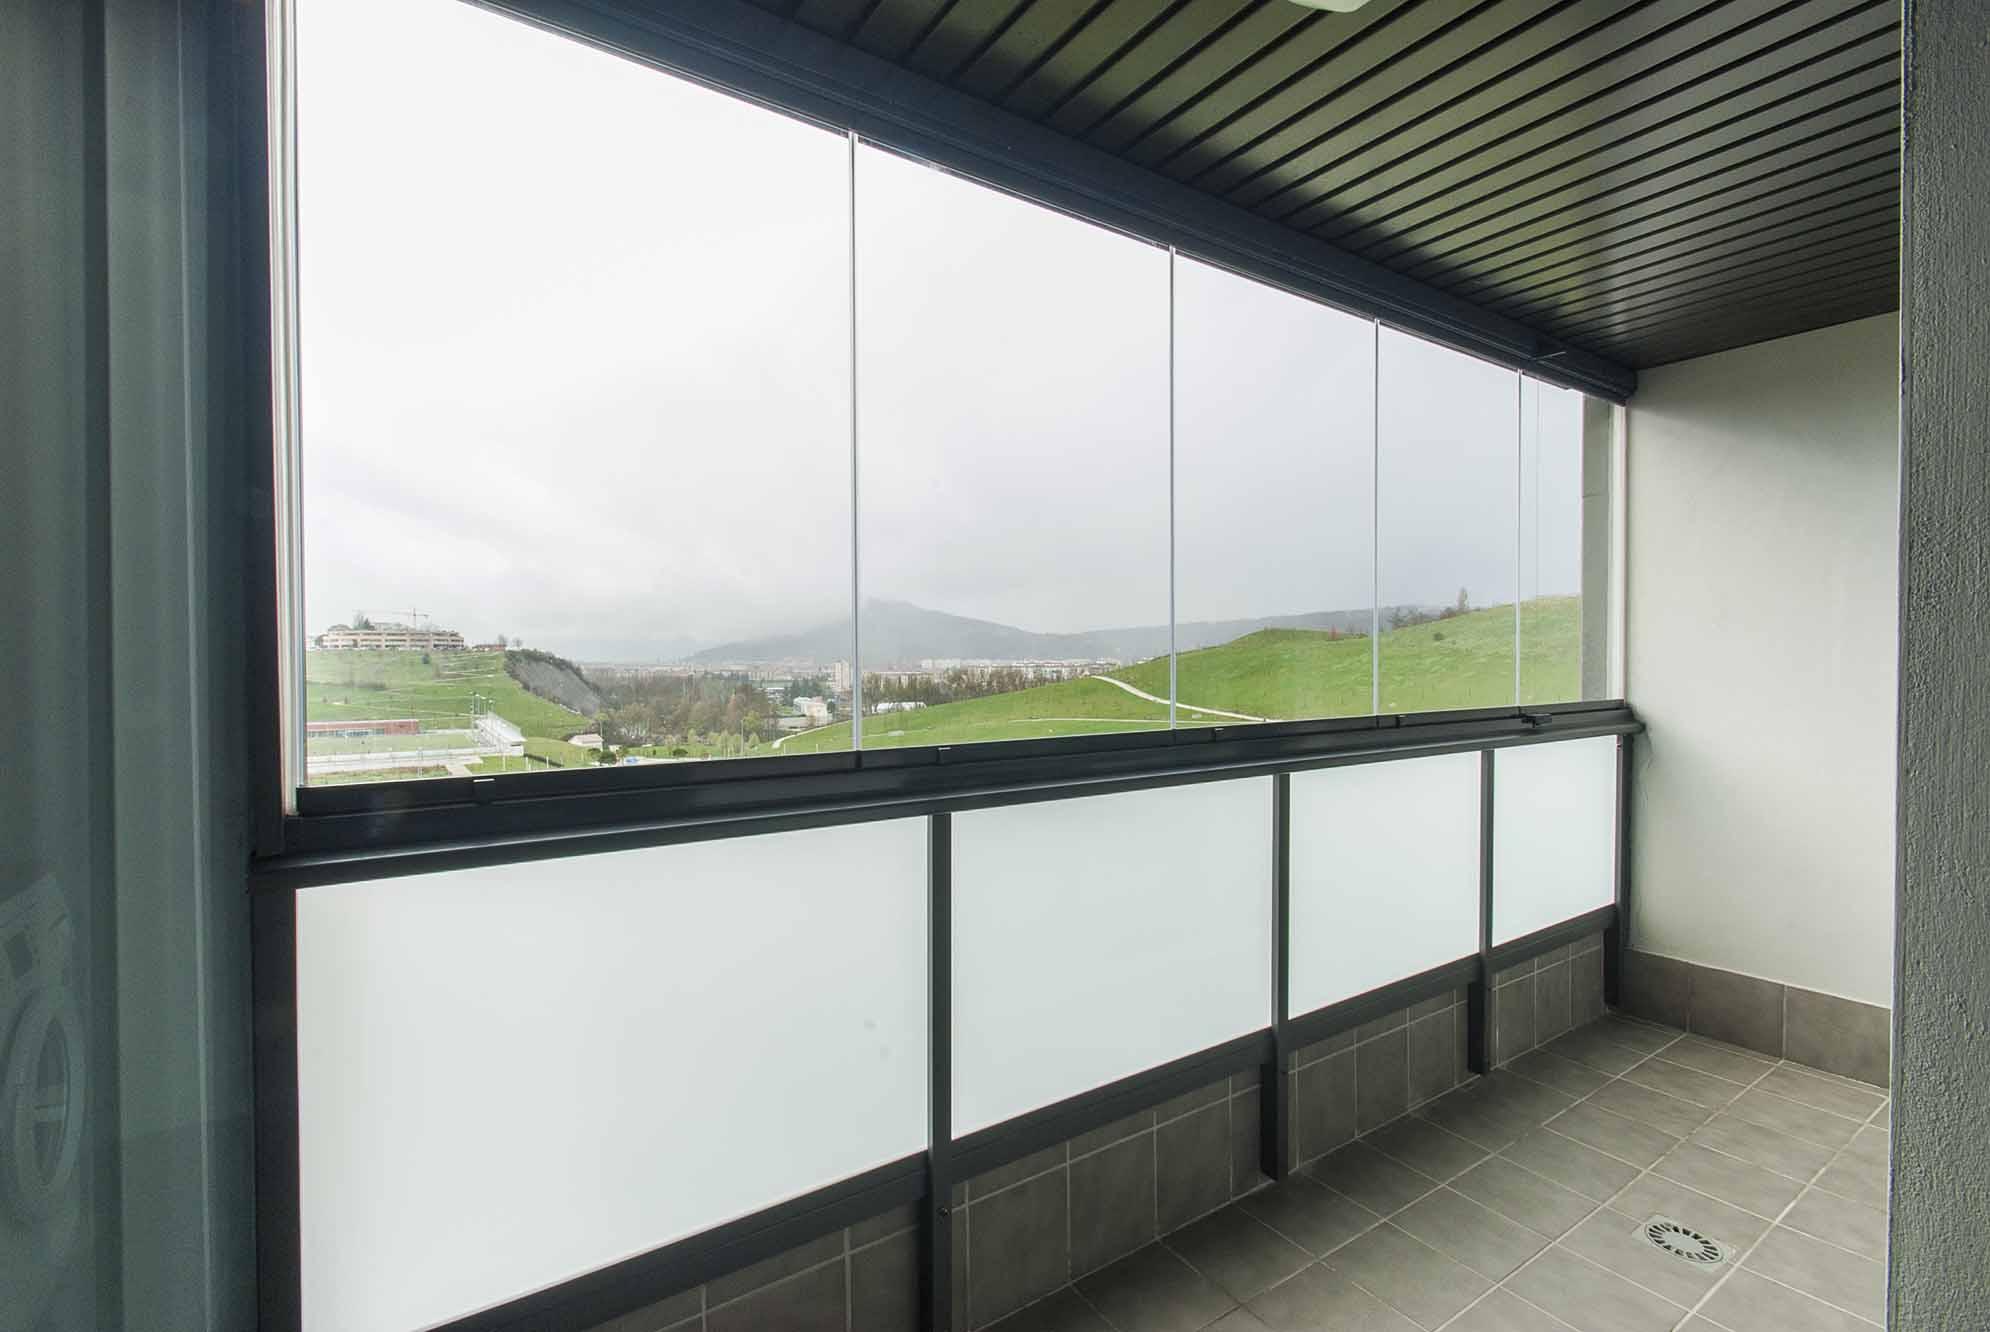 cerramientos-cristal-terrazas-viviendas-navarra-6